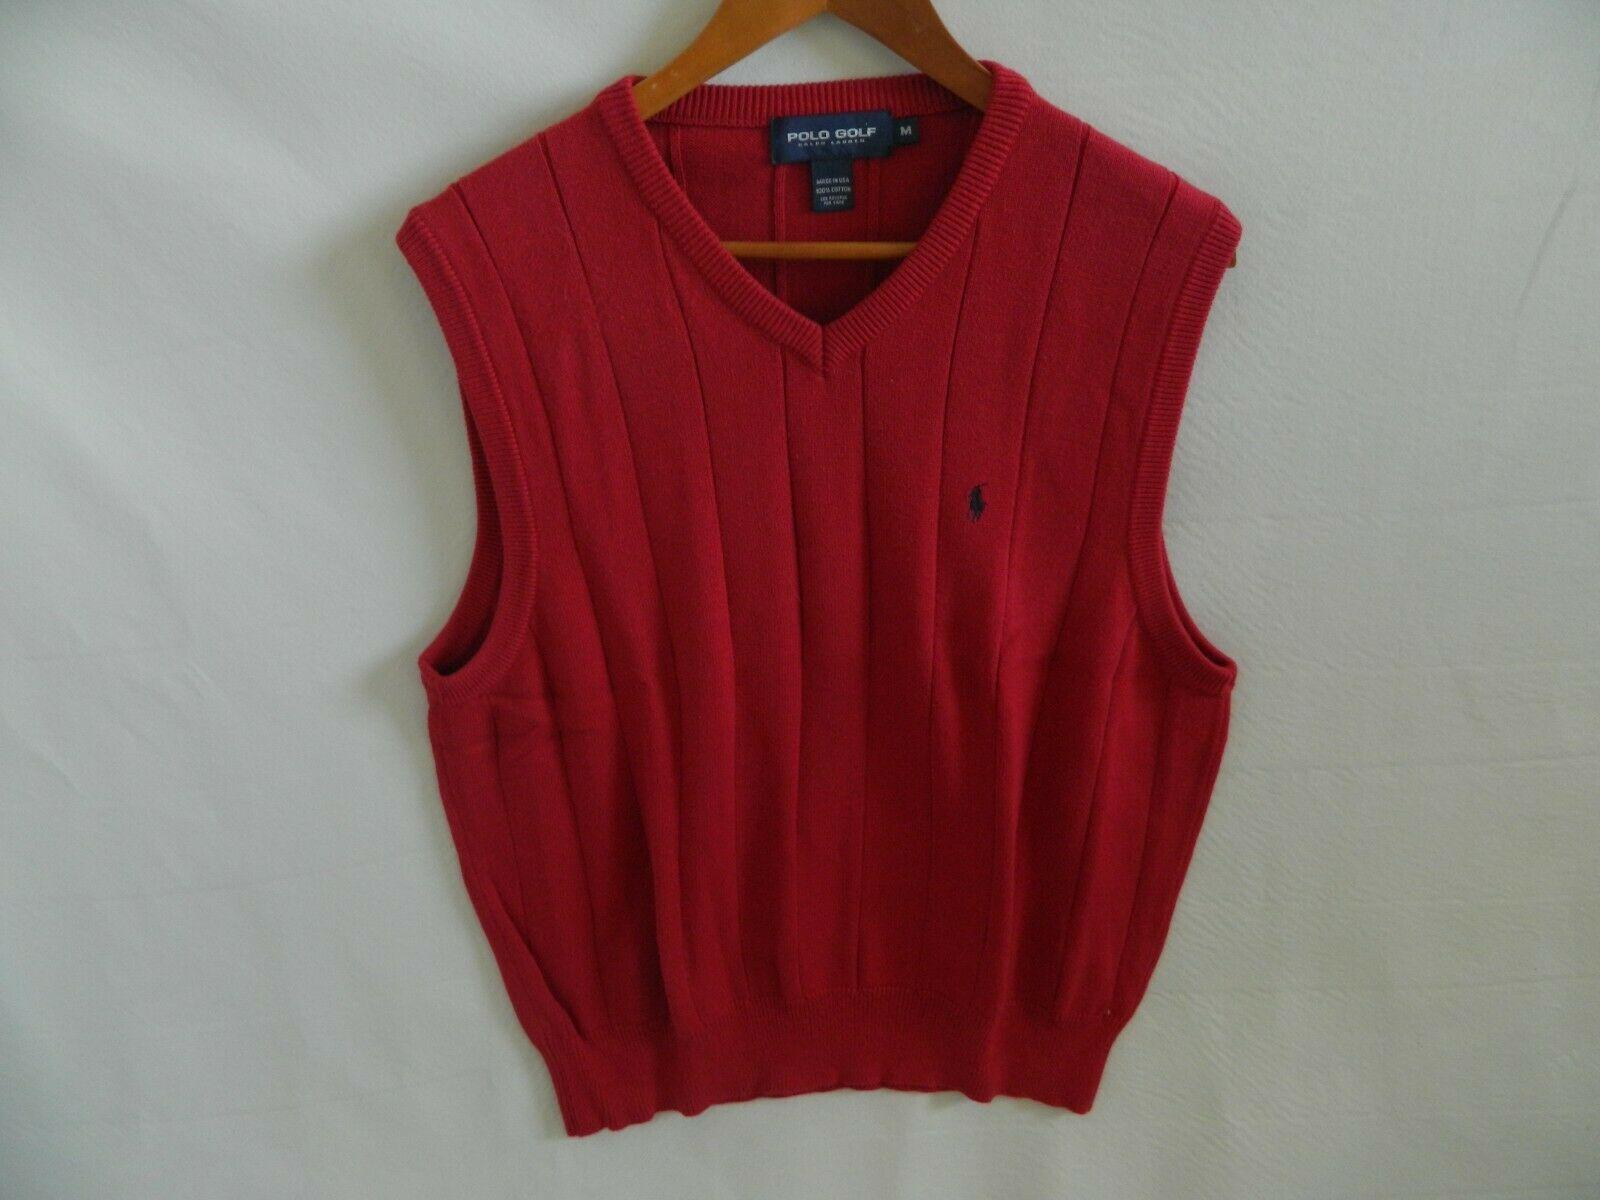 Polo Golf Ralph Lauren Mens Red 100% Cotton Sweater Vest Blue Pony Size M USA!